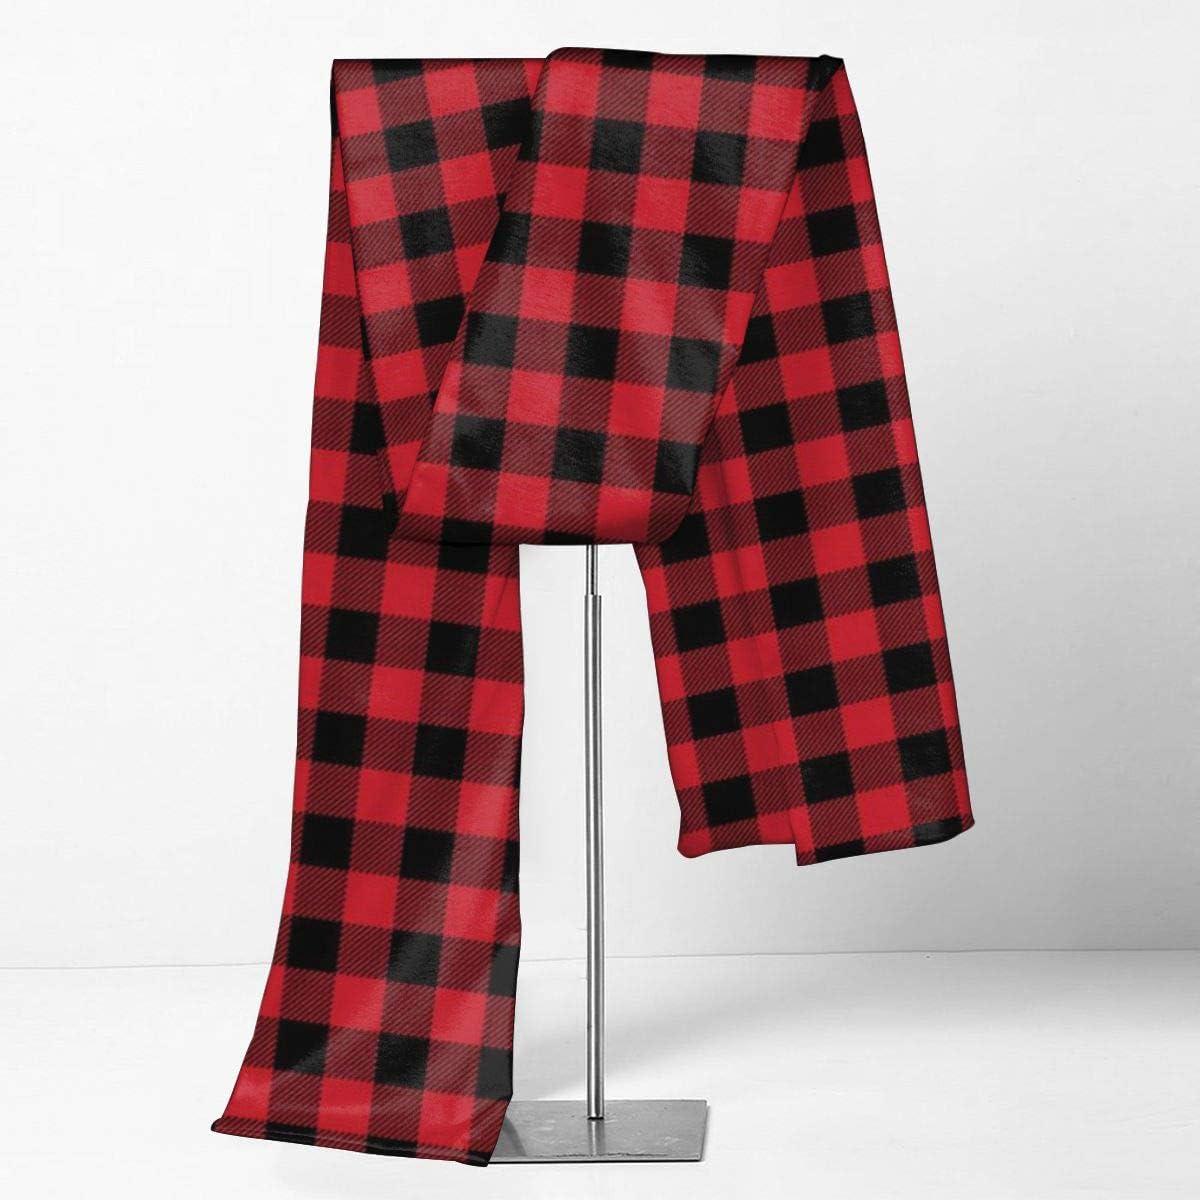 Rustic Red Black Buffalo Check Plaid Pattern Scarfs – Imported Lightweight Neckwear Blanket Wrap Winter Shawl